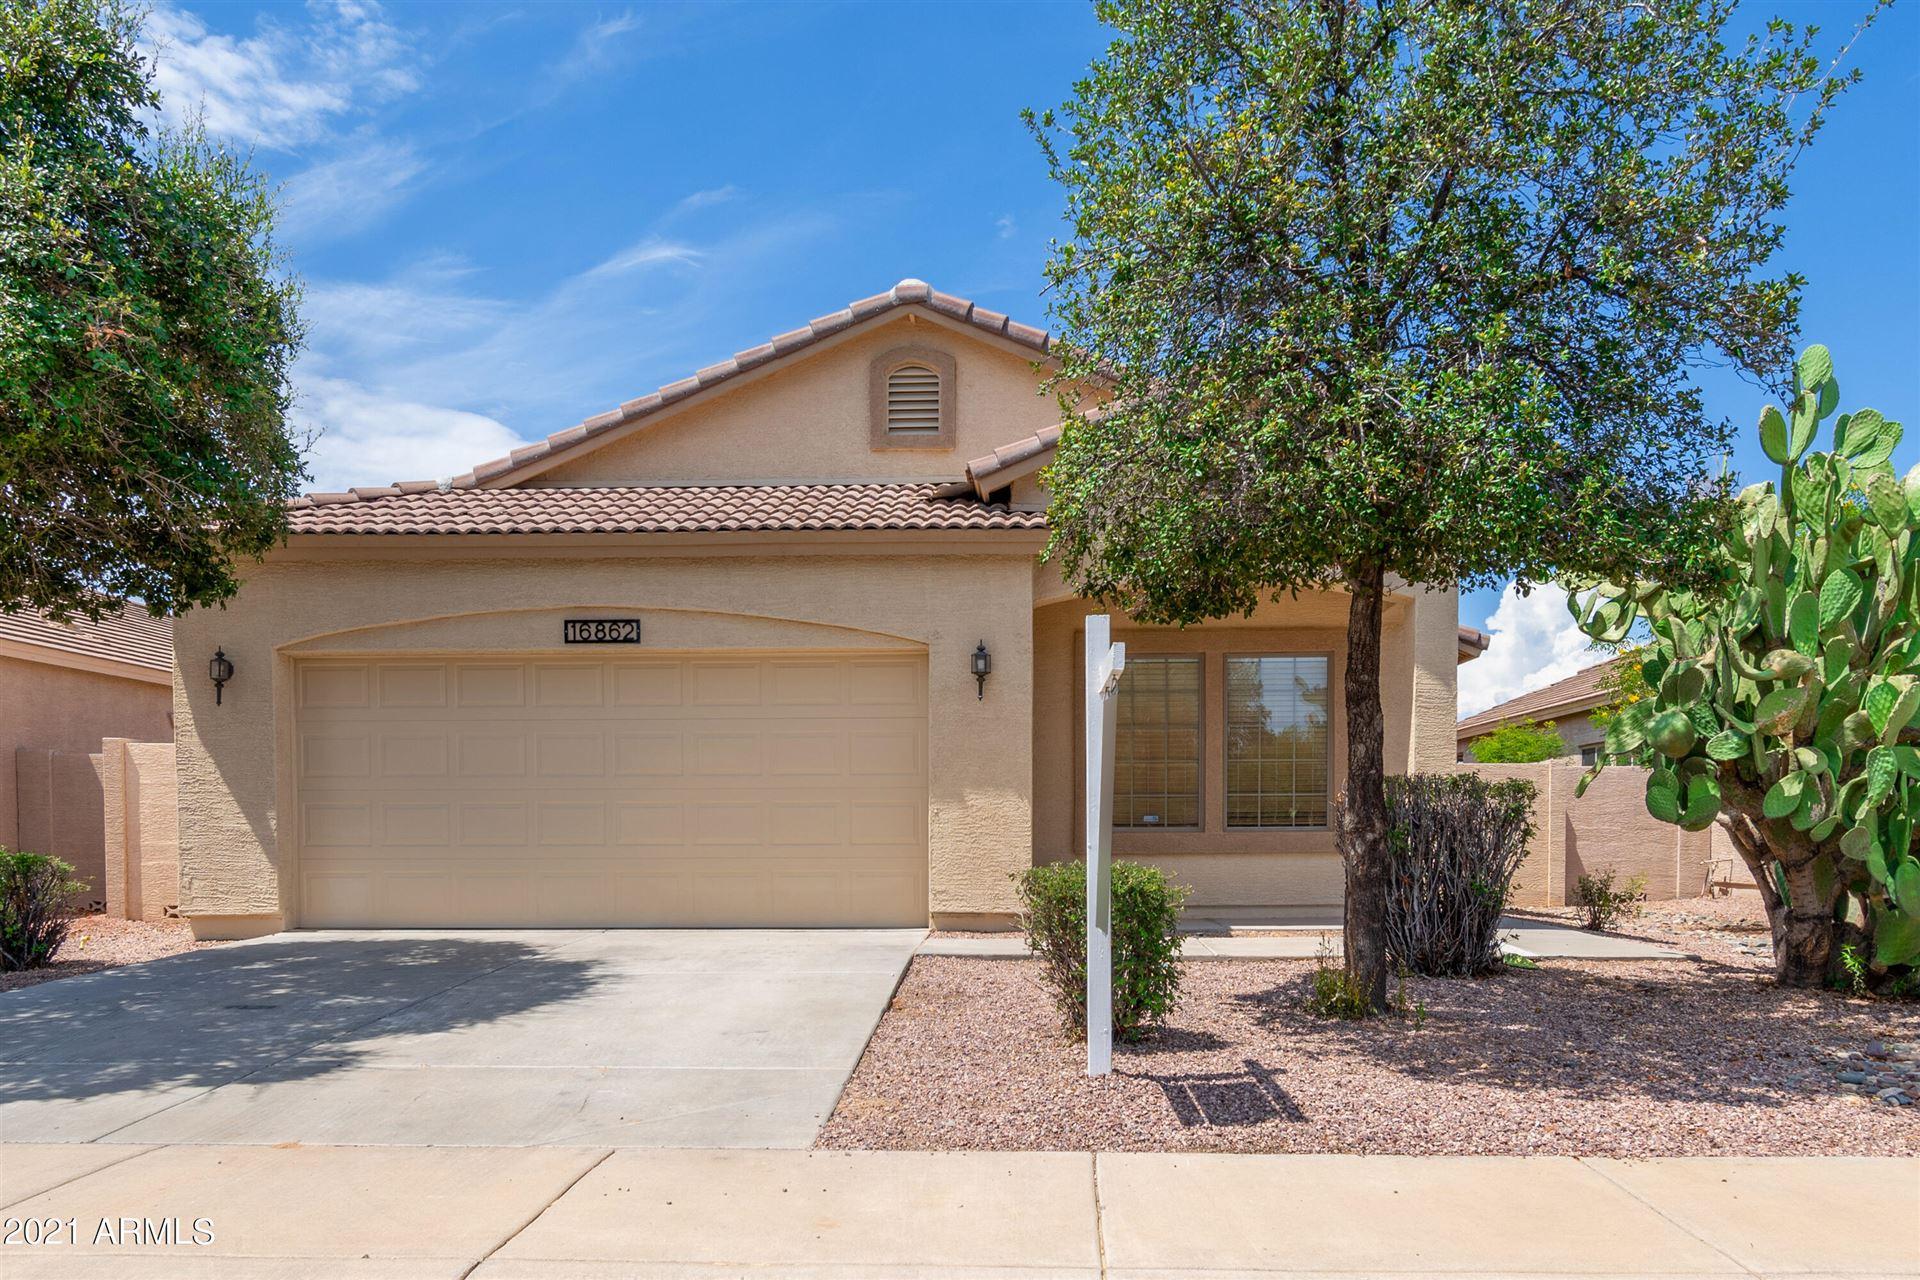 Photo of 16862 W POST Drive, Surprise, AZ 85388 (MLS # 6270418)